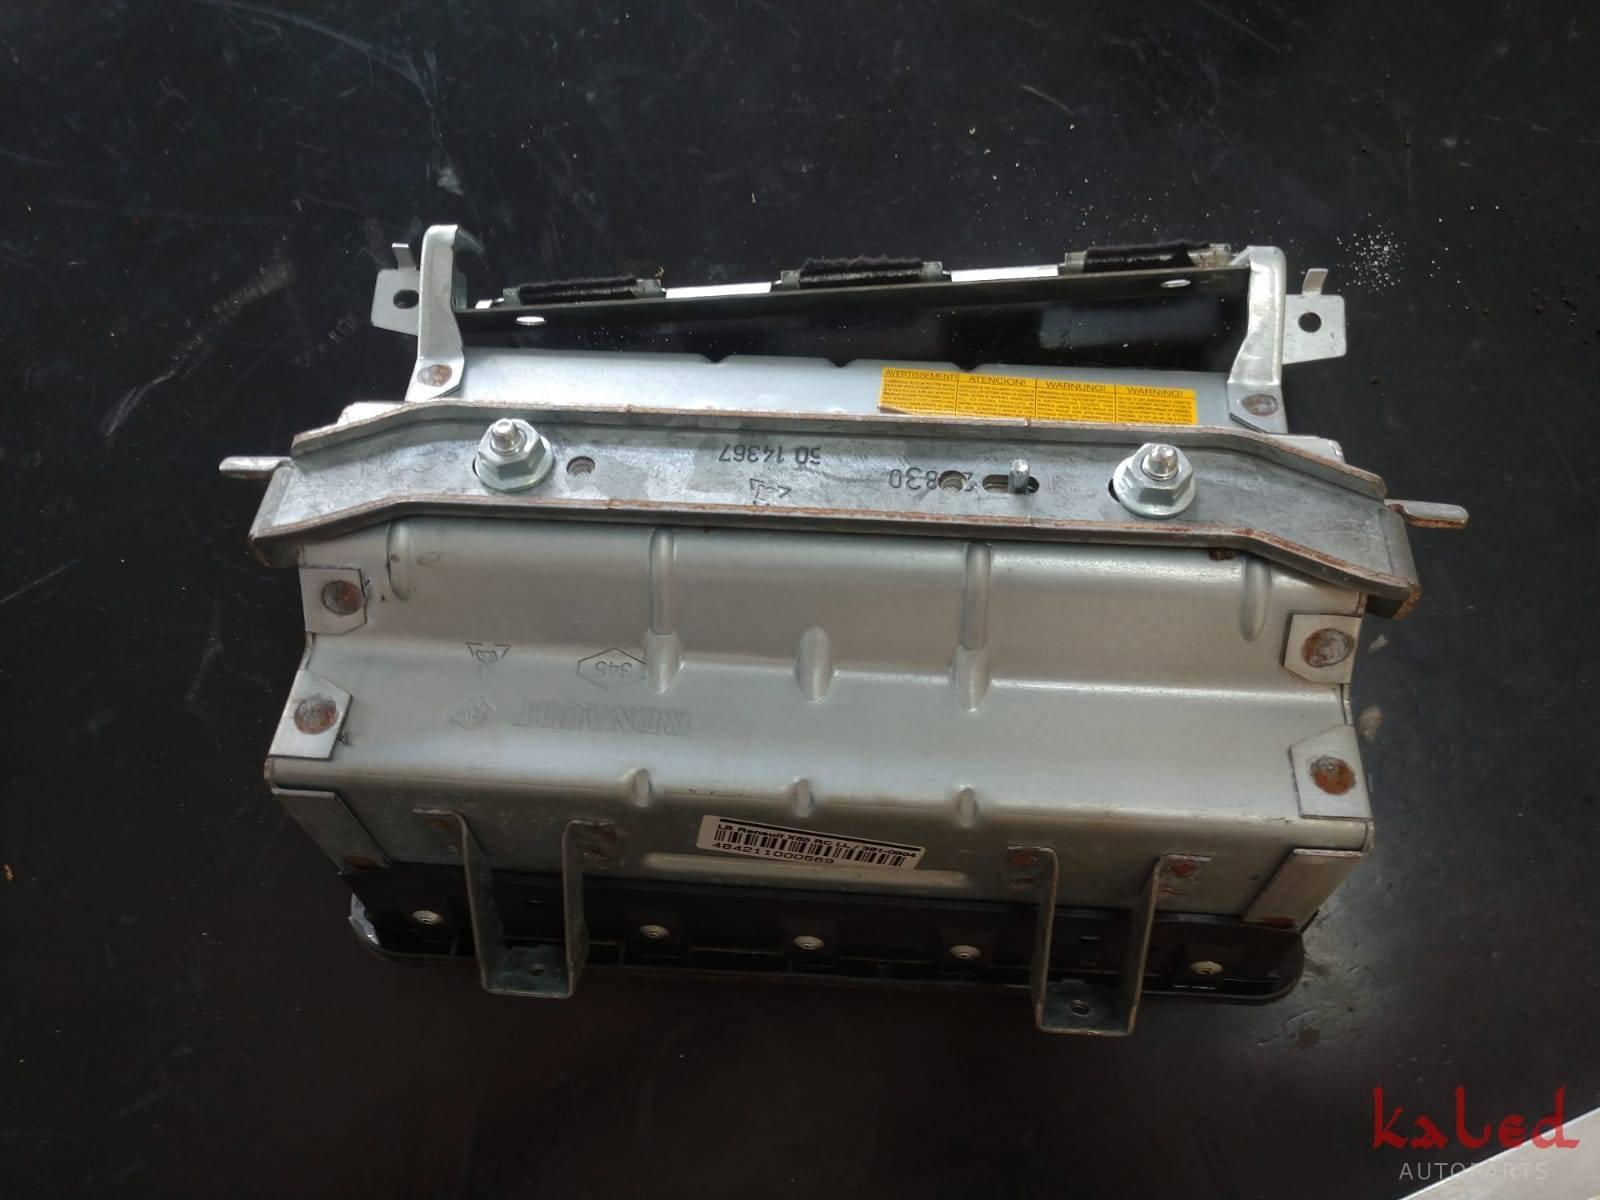 Air bag passageiro Renault Clio 1999/2006 - Kaled Auto Parts